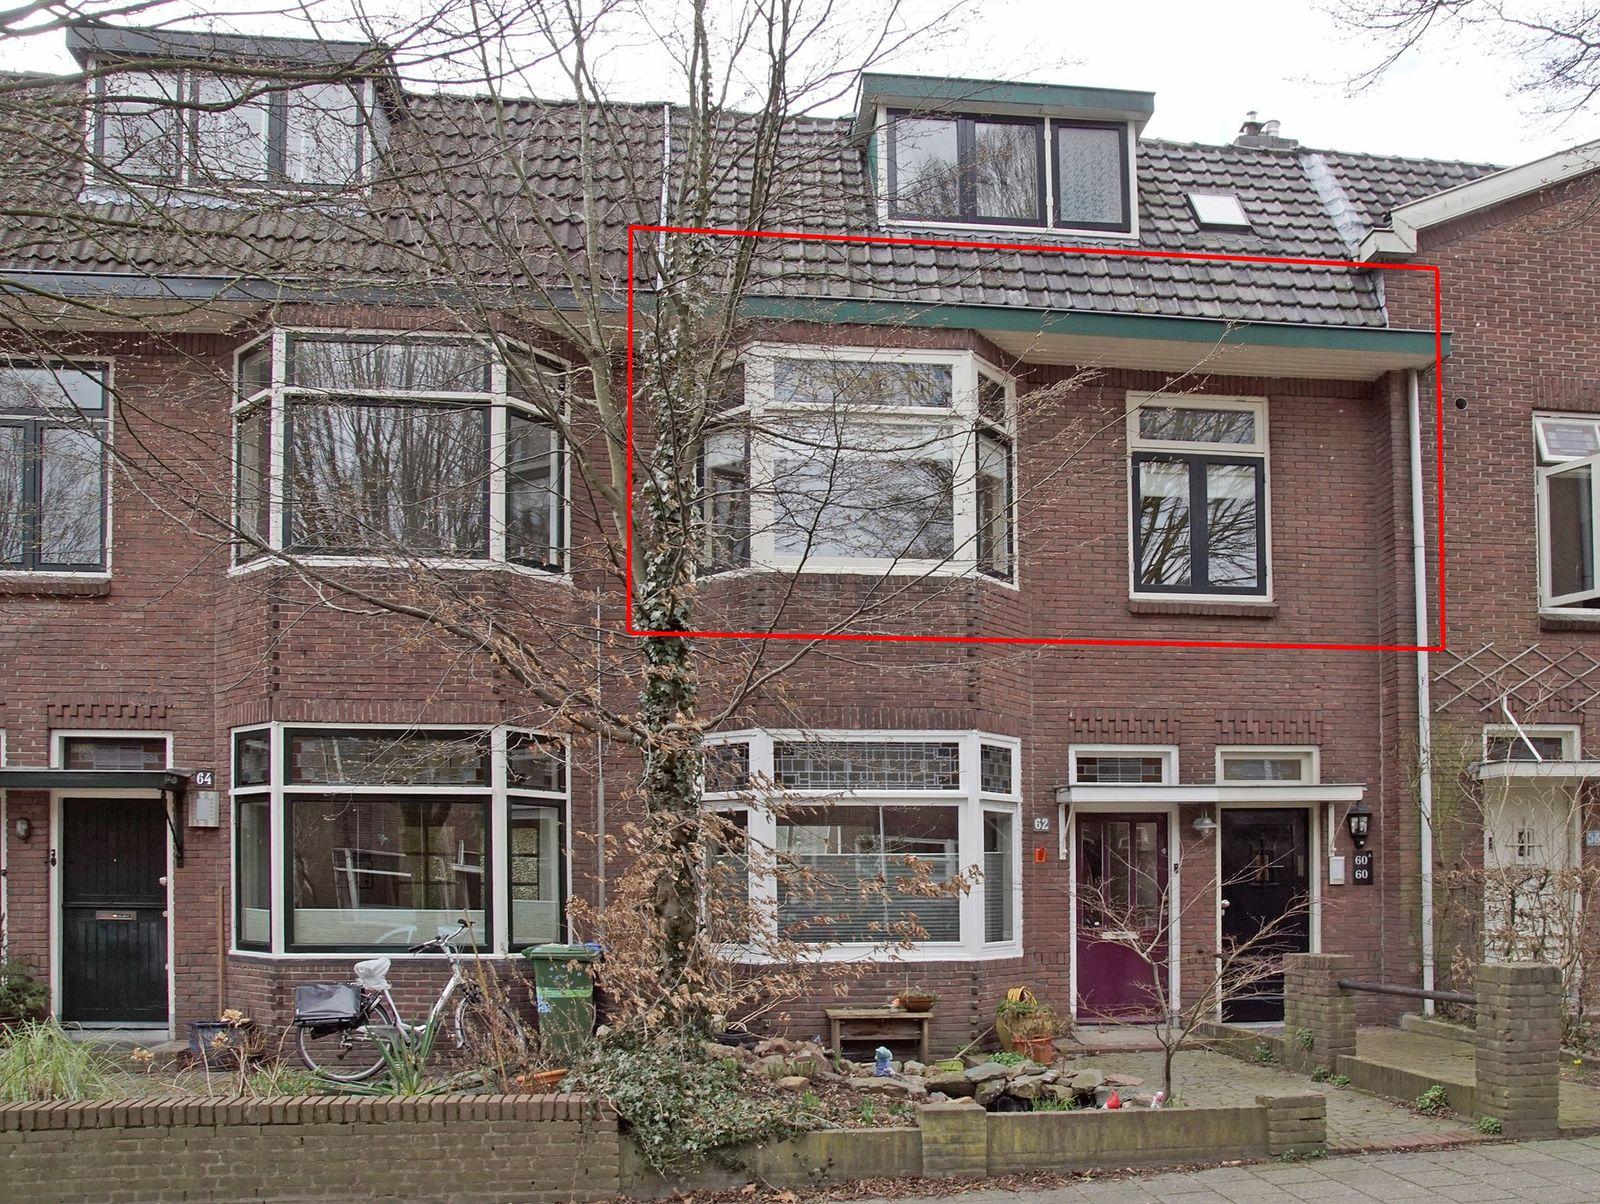 Frans Halsstraat 60, Nijmegen